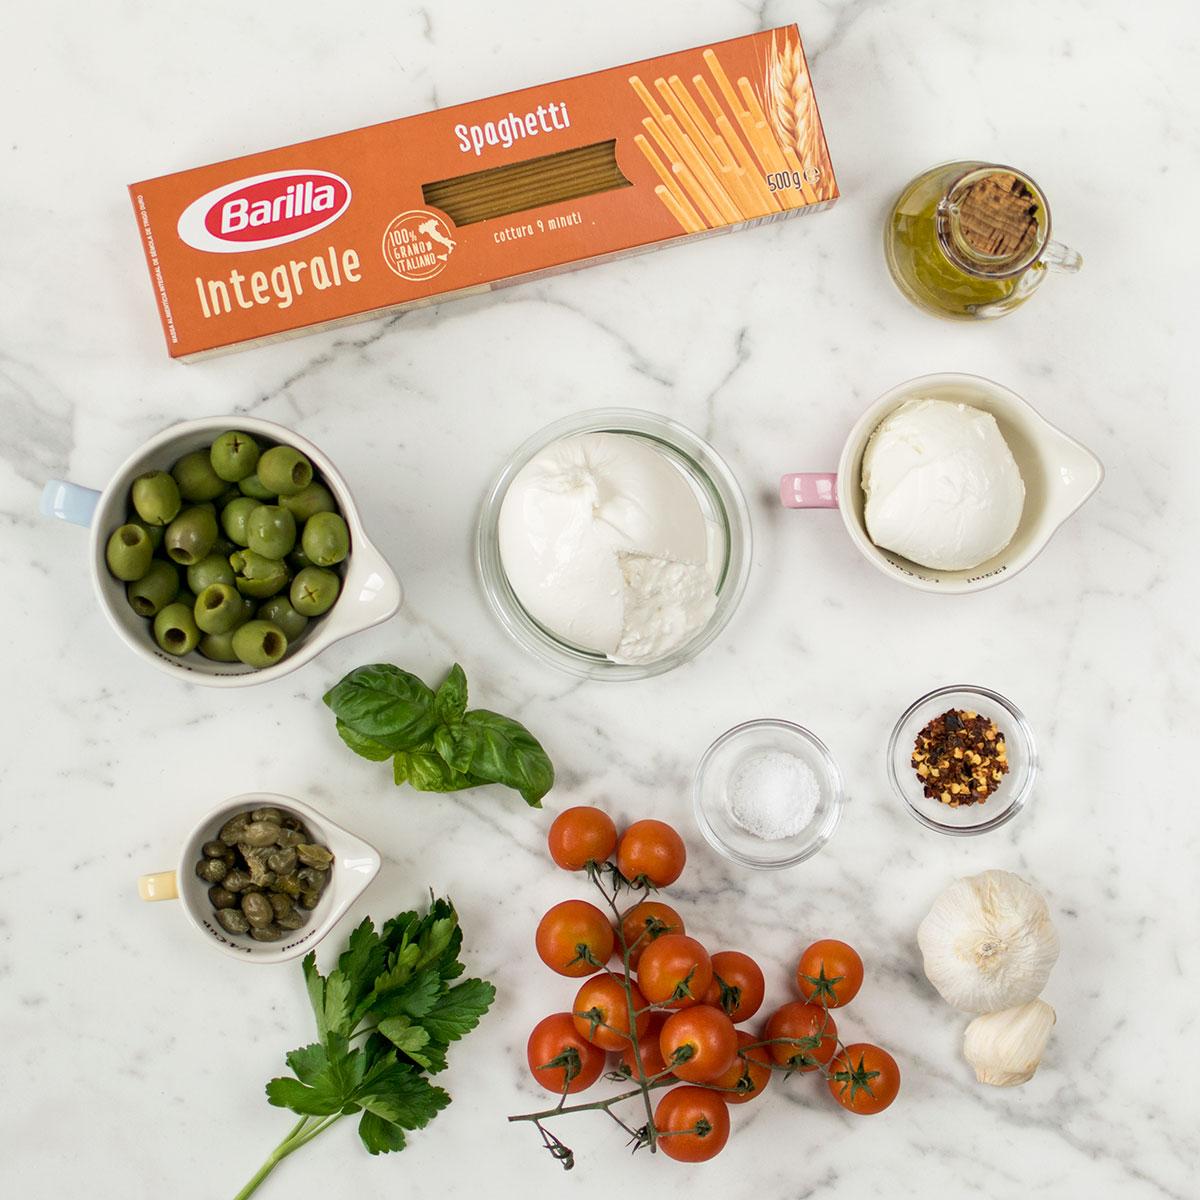 spaghetti_integrali_pomodorini_burrata_ingredienti